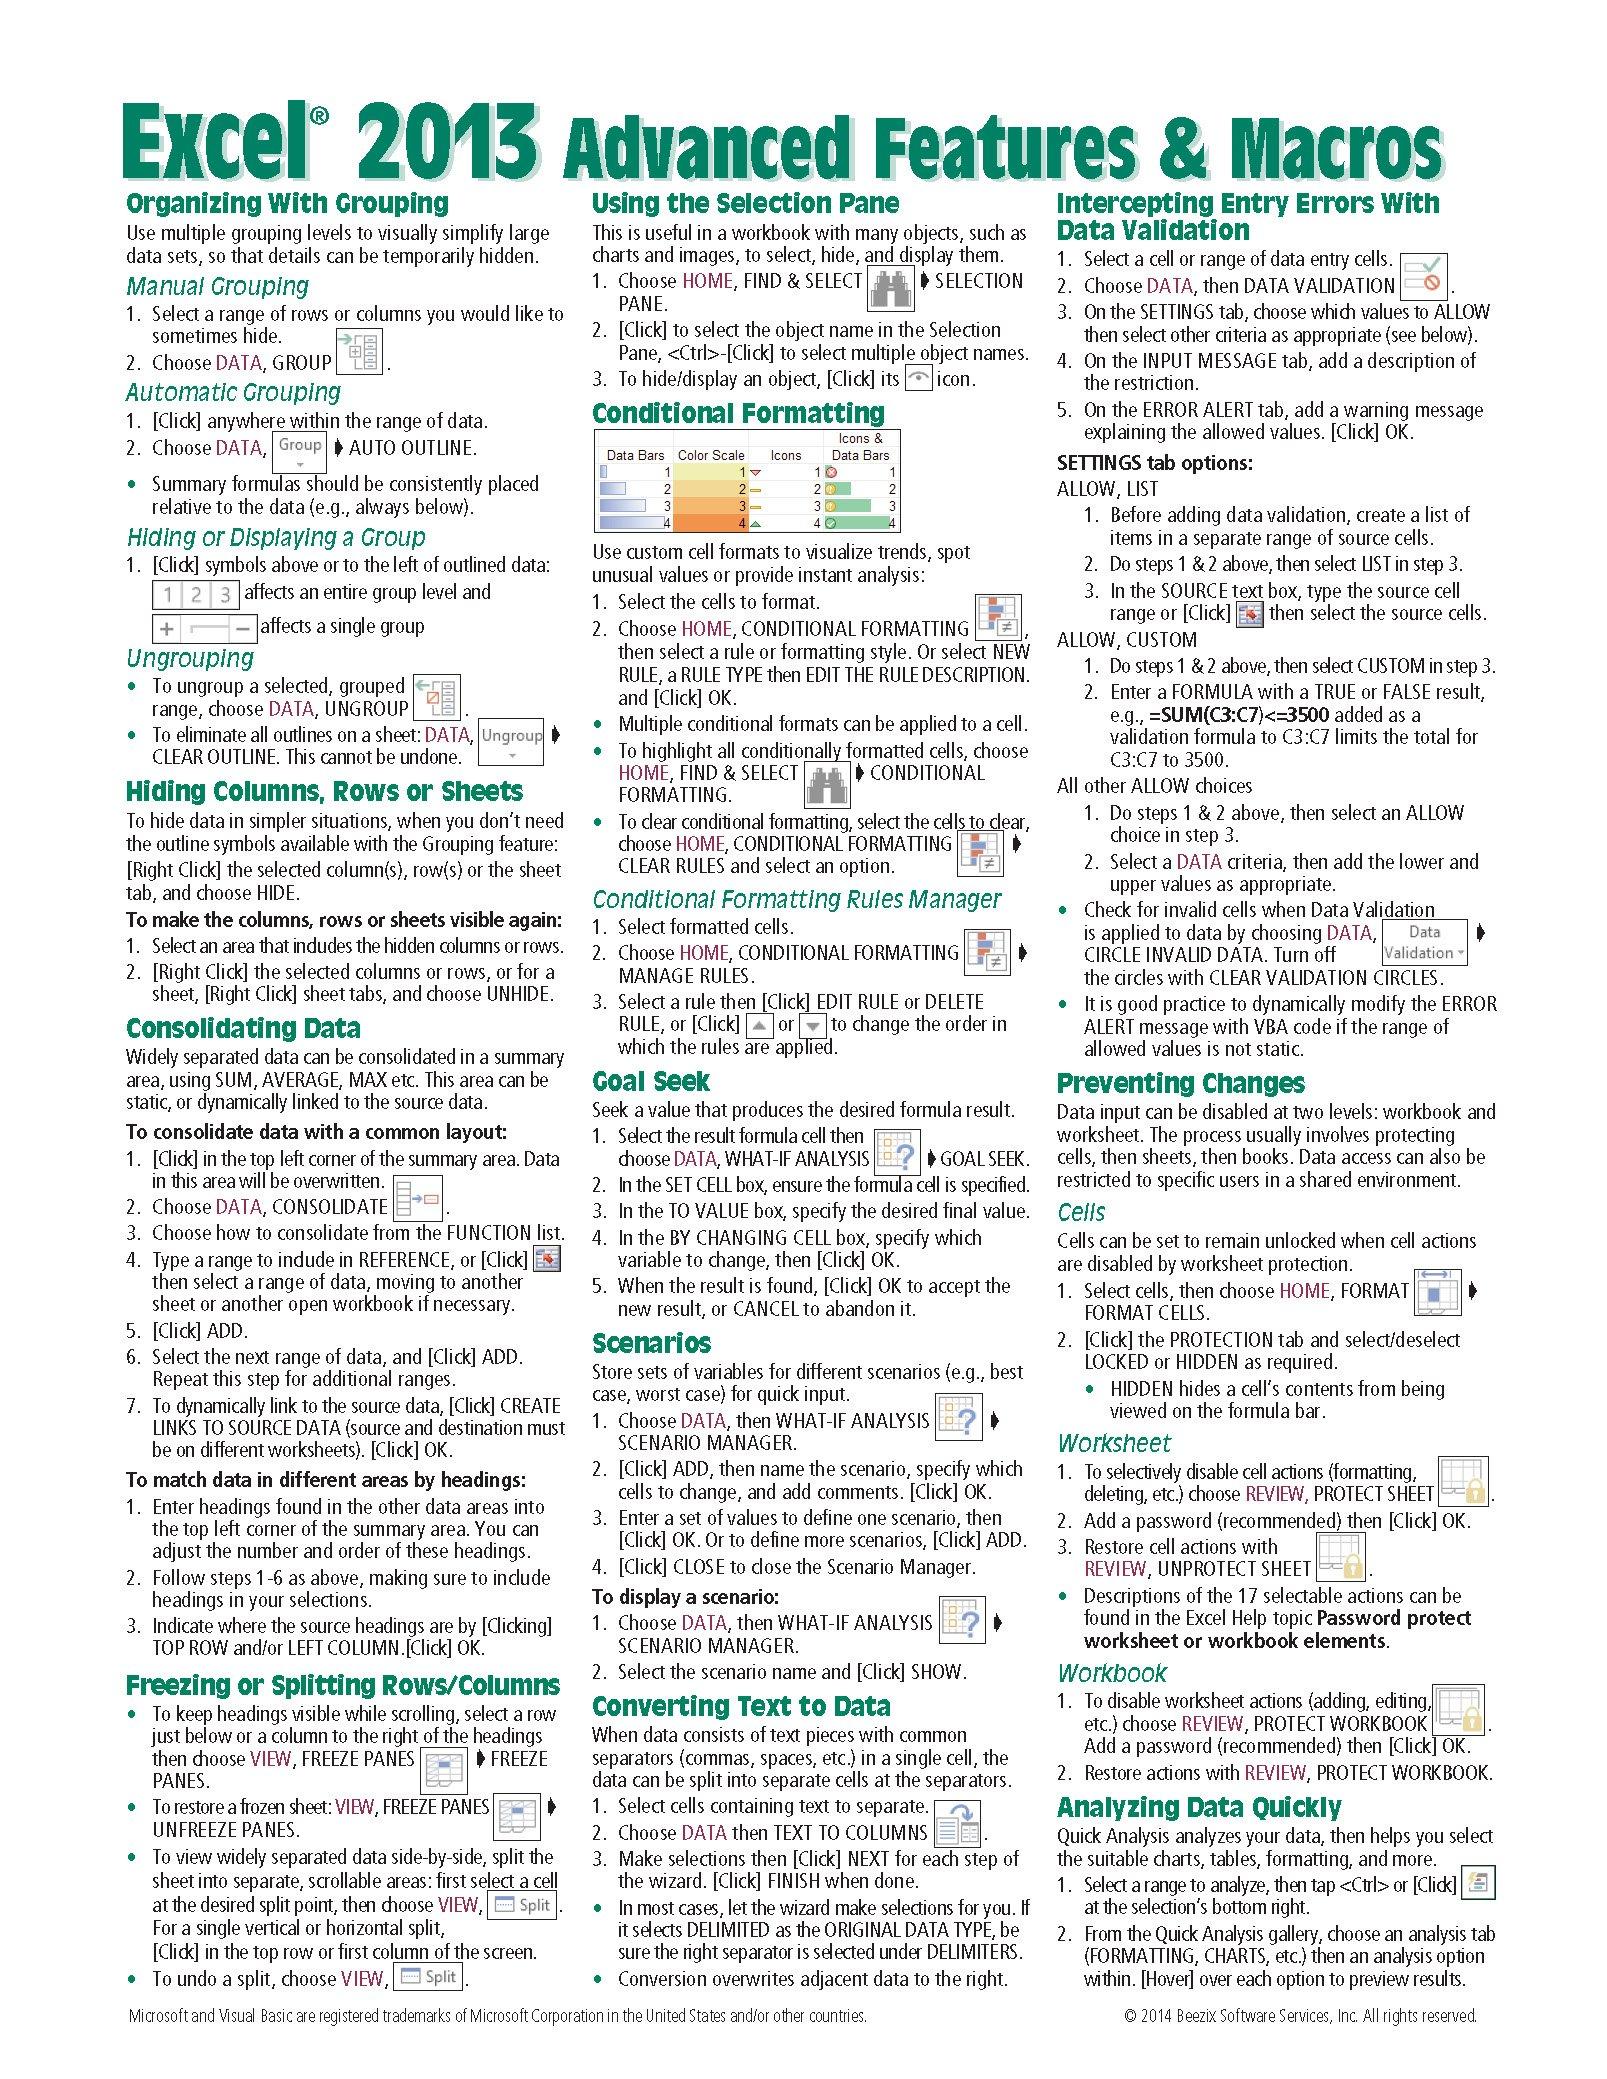 Microsoft Advanced Reference Instructions Shortcuts